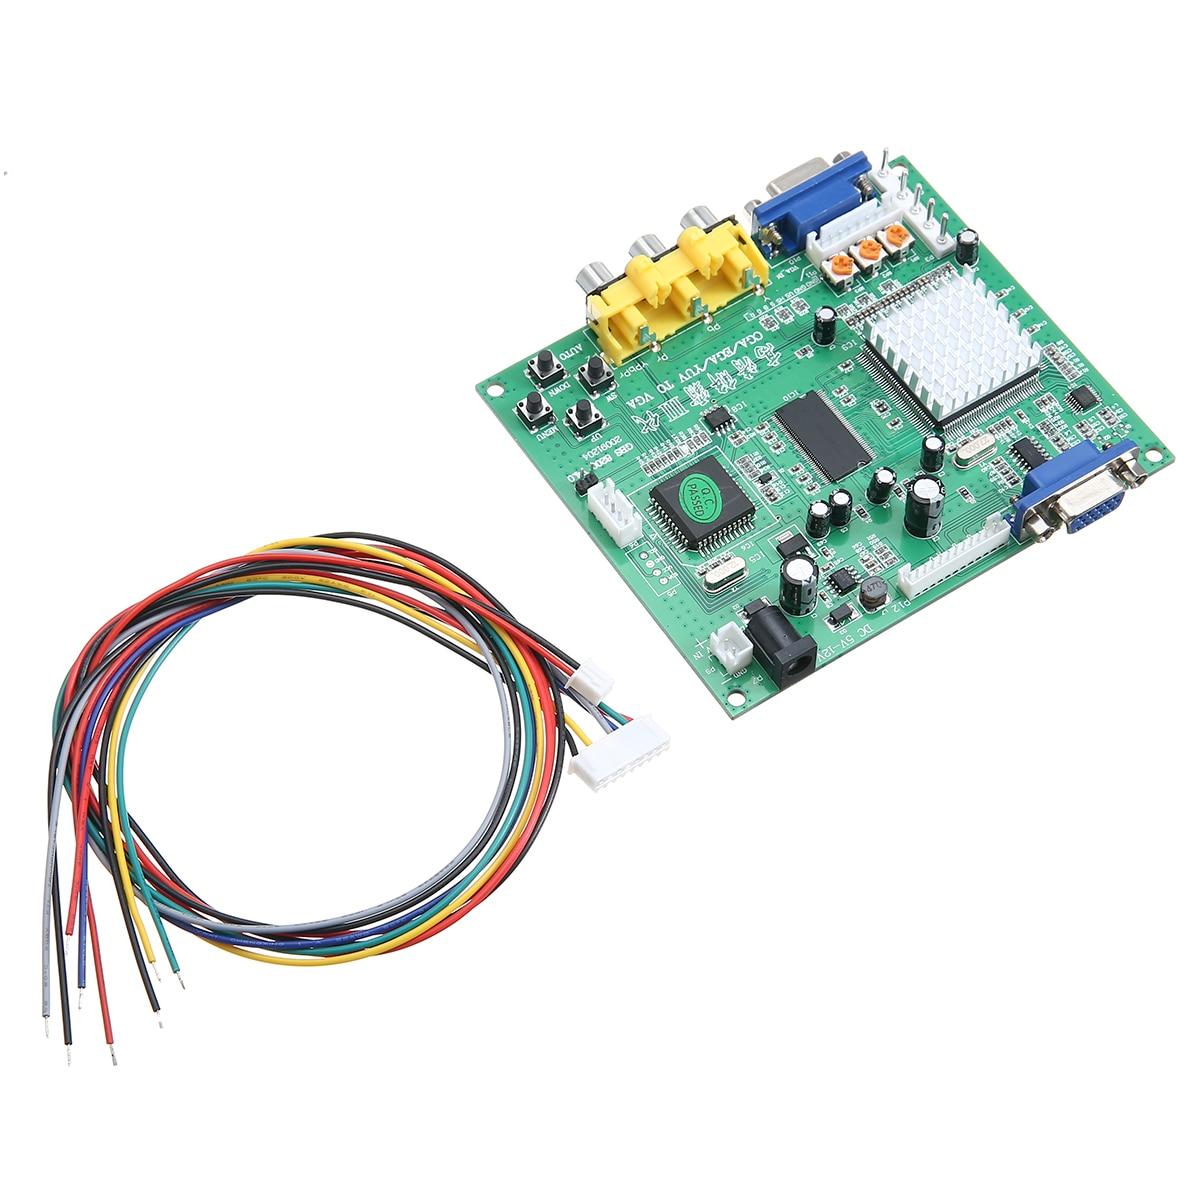 Hohe Qualität GBS8200 Video Converter Board Platte Für RCA zu VGA Arcade Spiel HD Gaming Umwandlung Boards W/Draht